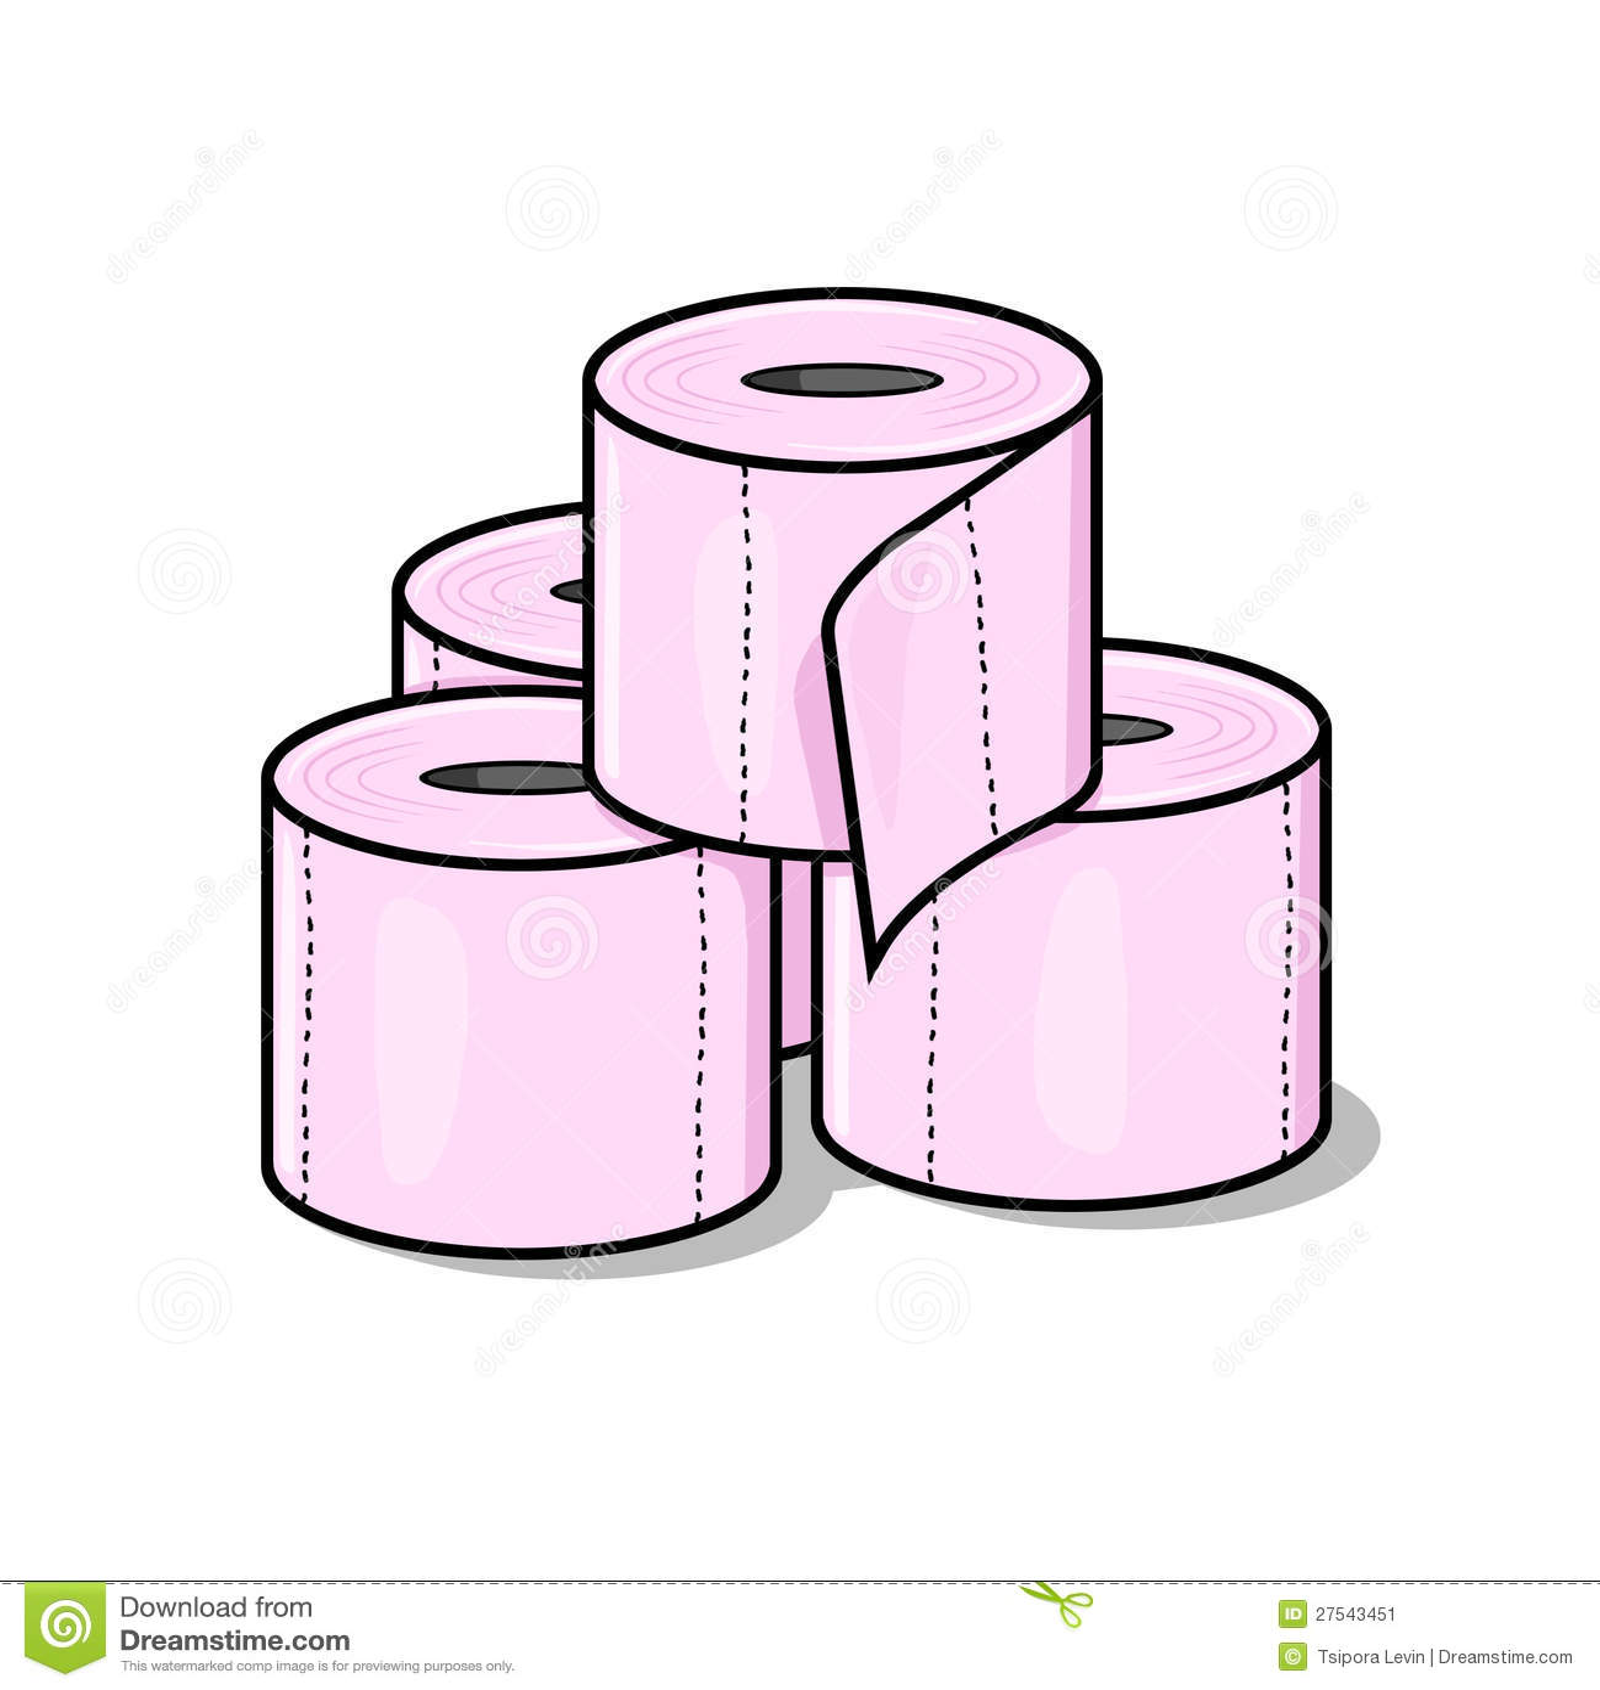 toilet paper rolls illustration stock illustration illustration rh dreamstime com toilet paper clipart free toilet paper roll clipart